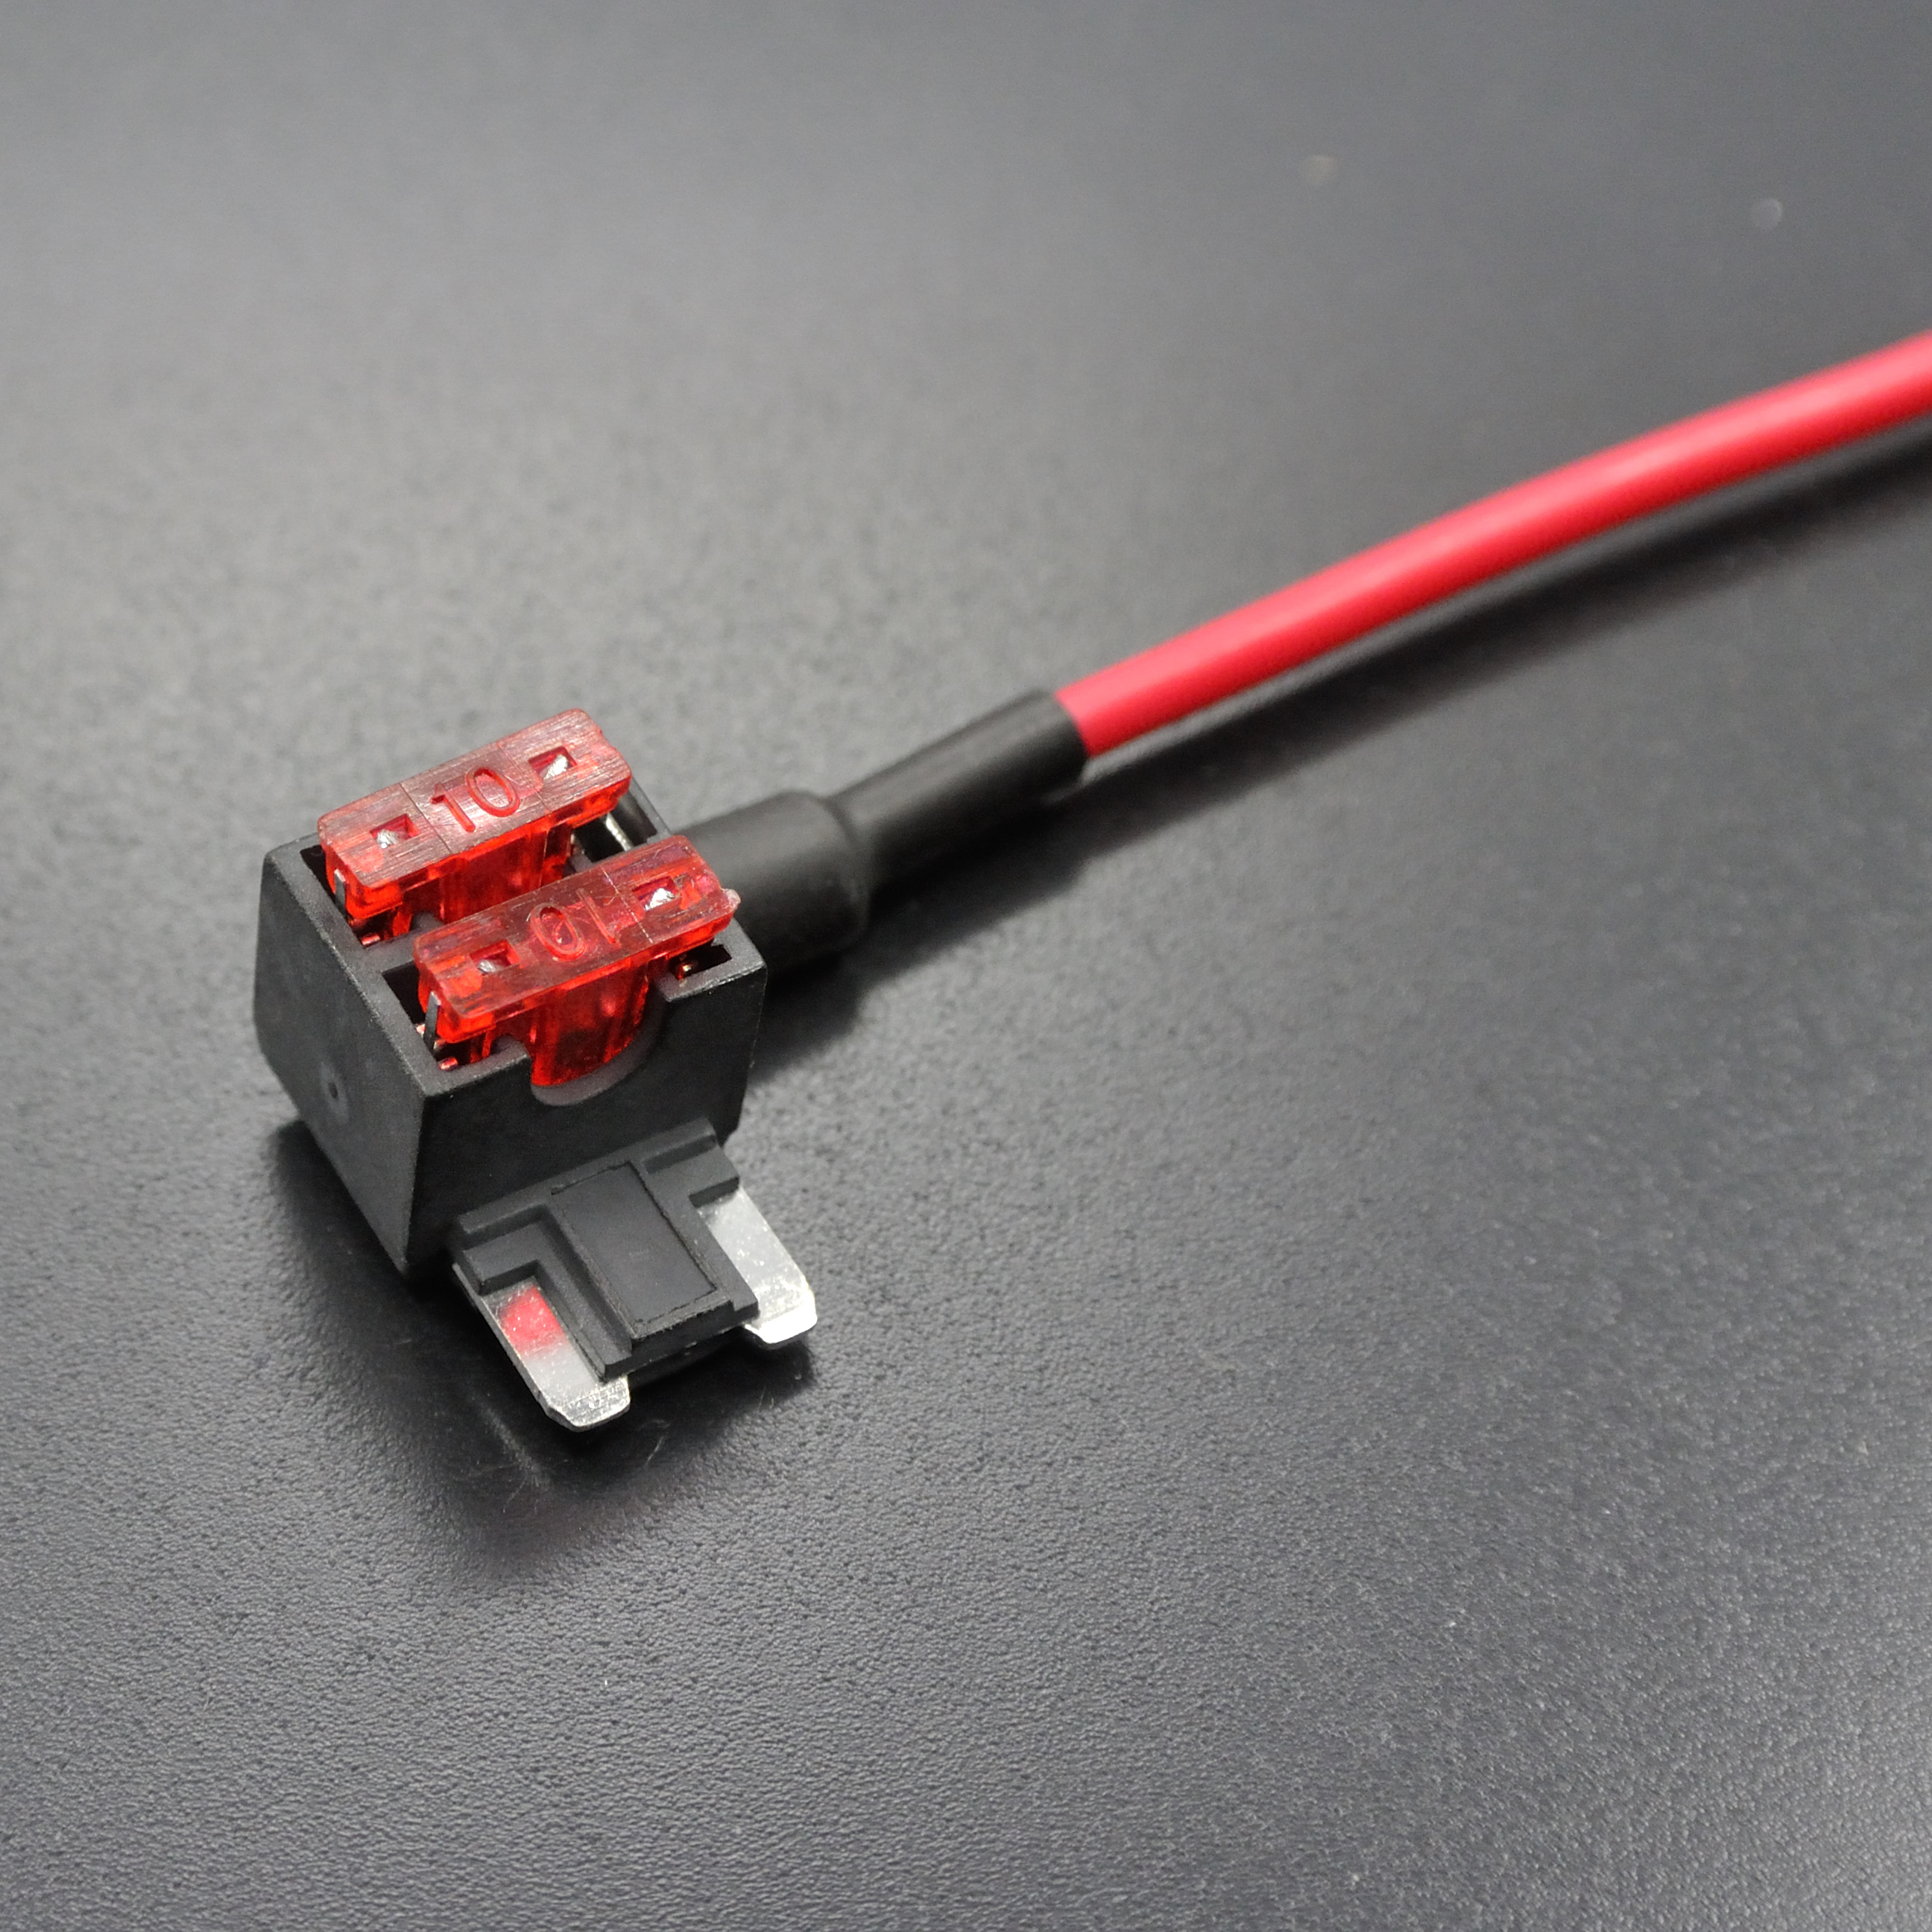 Lumision 16awg Car Addacircuit Atm Apm Mini Fuse Tap Fusetap Fuse